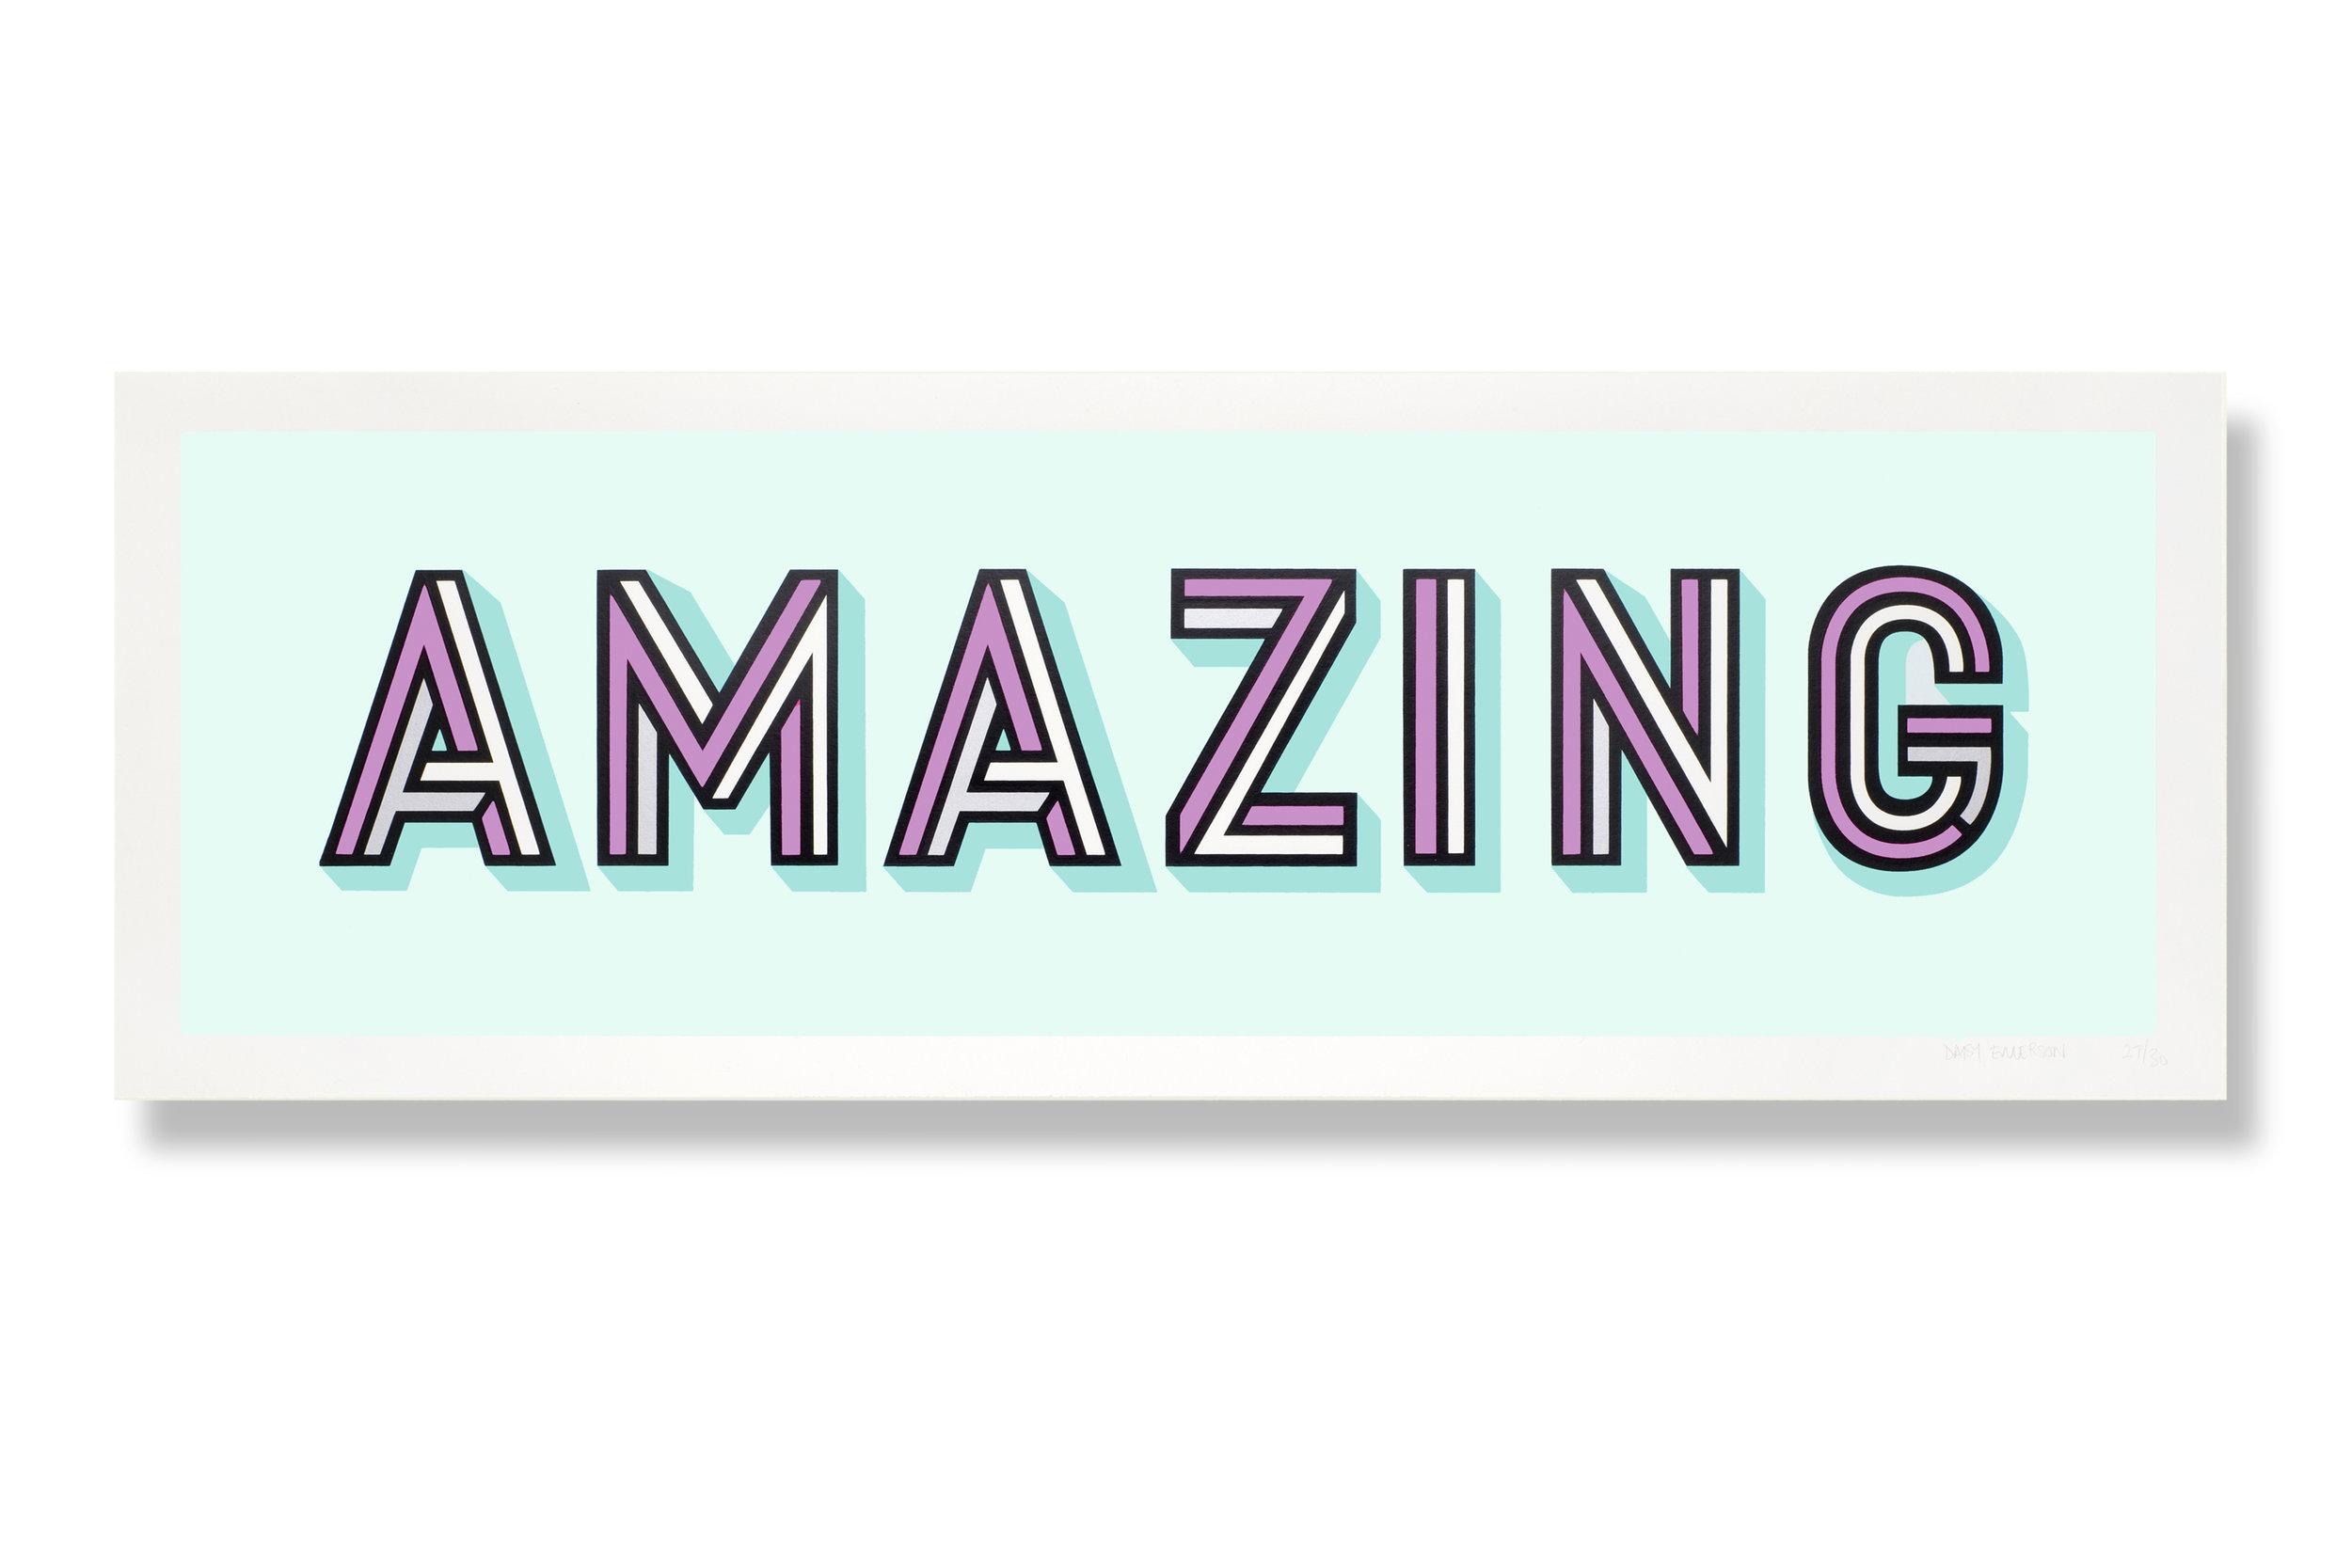 AMAZING - Mint